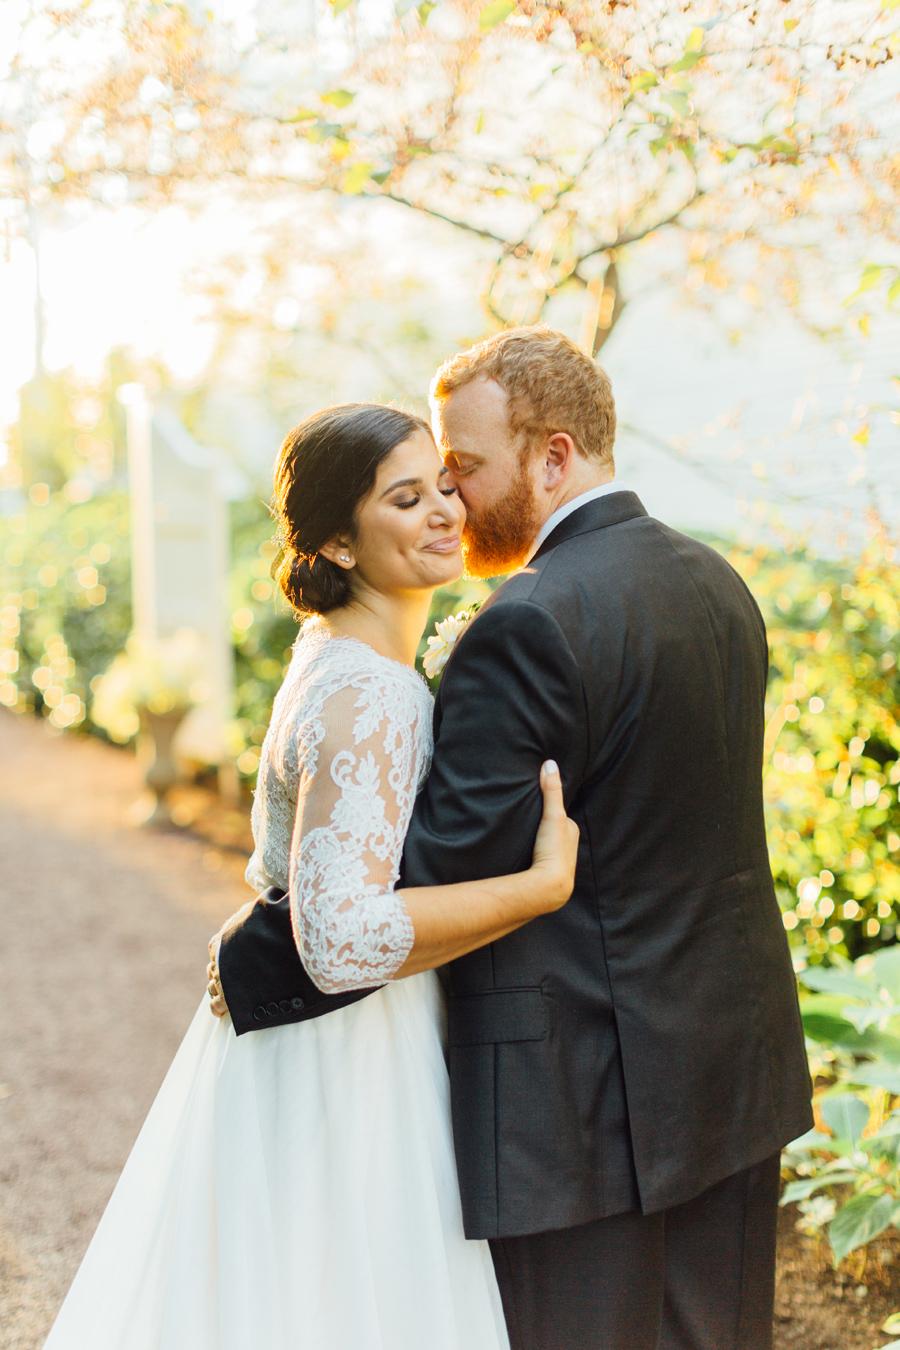 the-inn-at-leola-wedding-lancaster-pennsylvania-wedding-photographer-rebeka-viola-photograhy (81).jpg